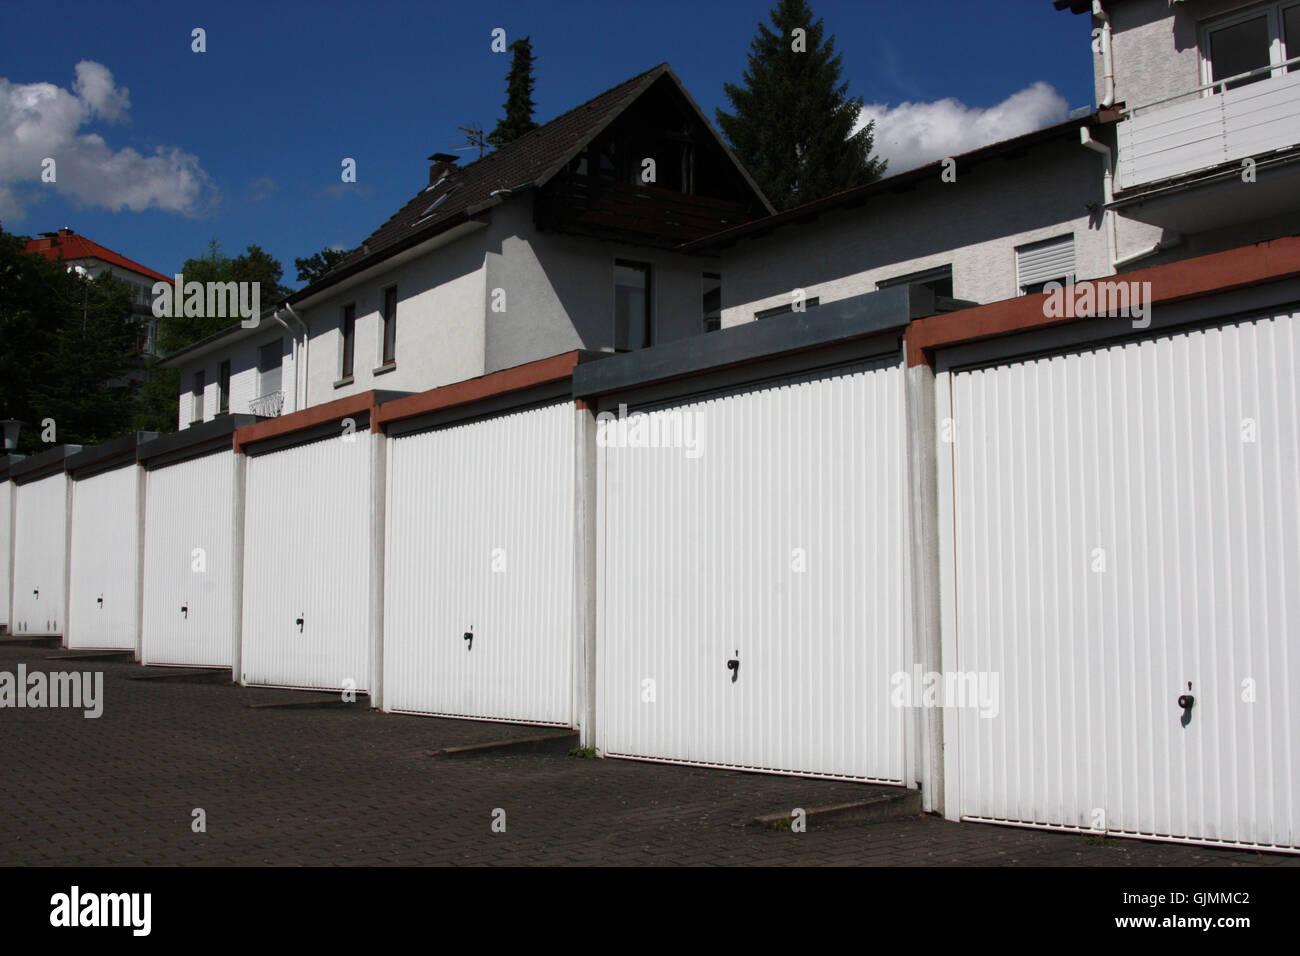 Garaje de chapa corrugada garajes Imagen De Stock